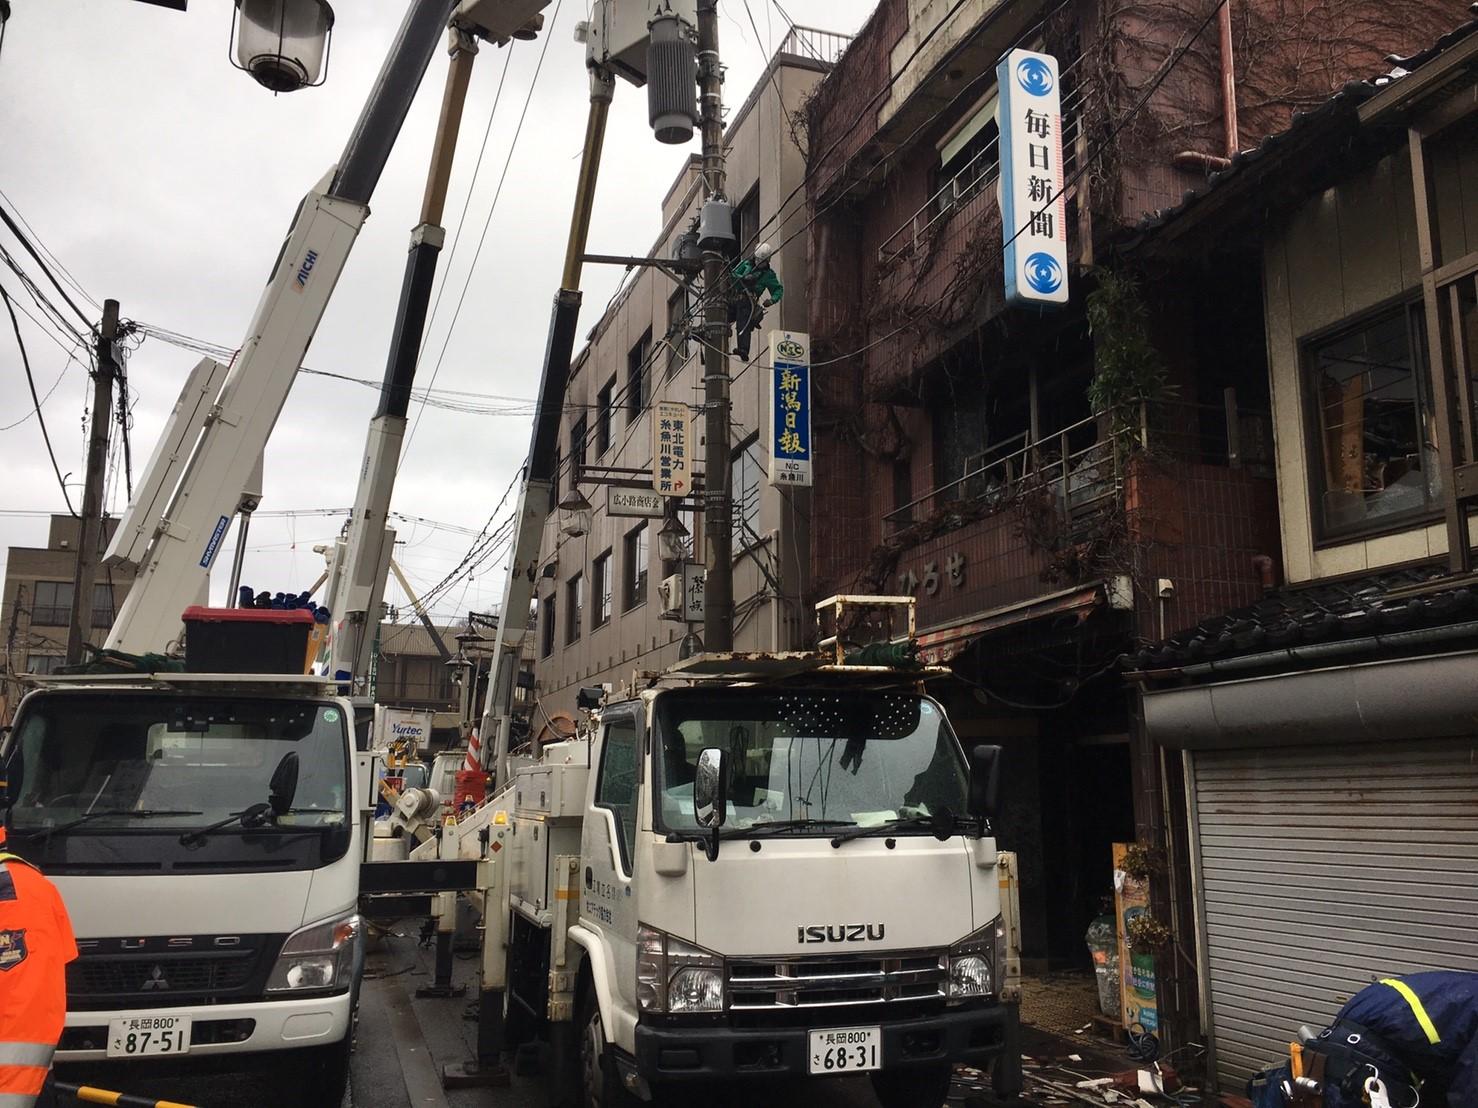 /data/project/260/糸魚川大火現場写真_170622_0010.jpg